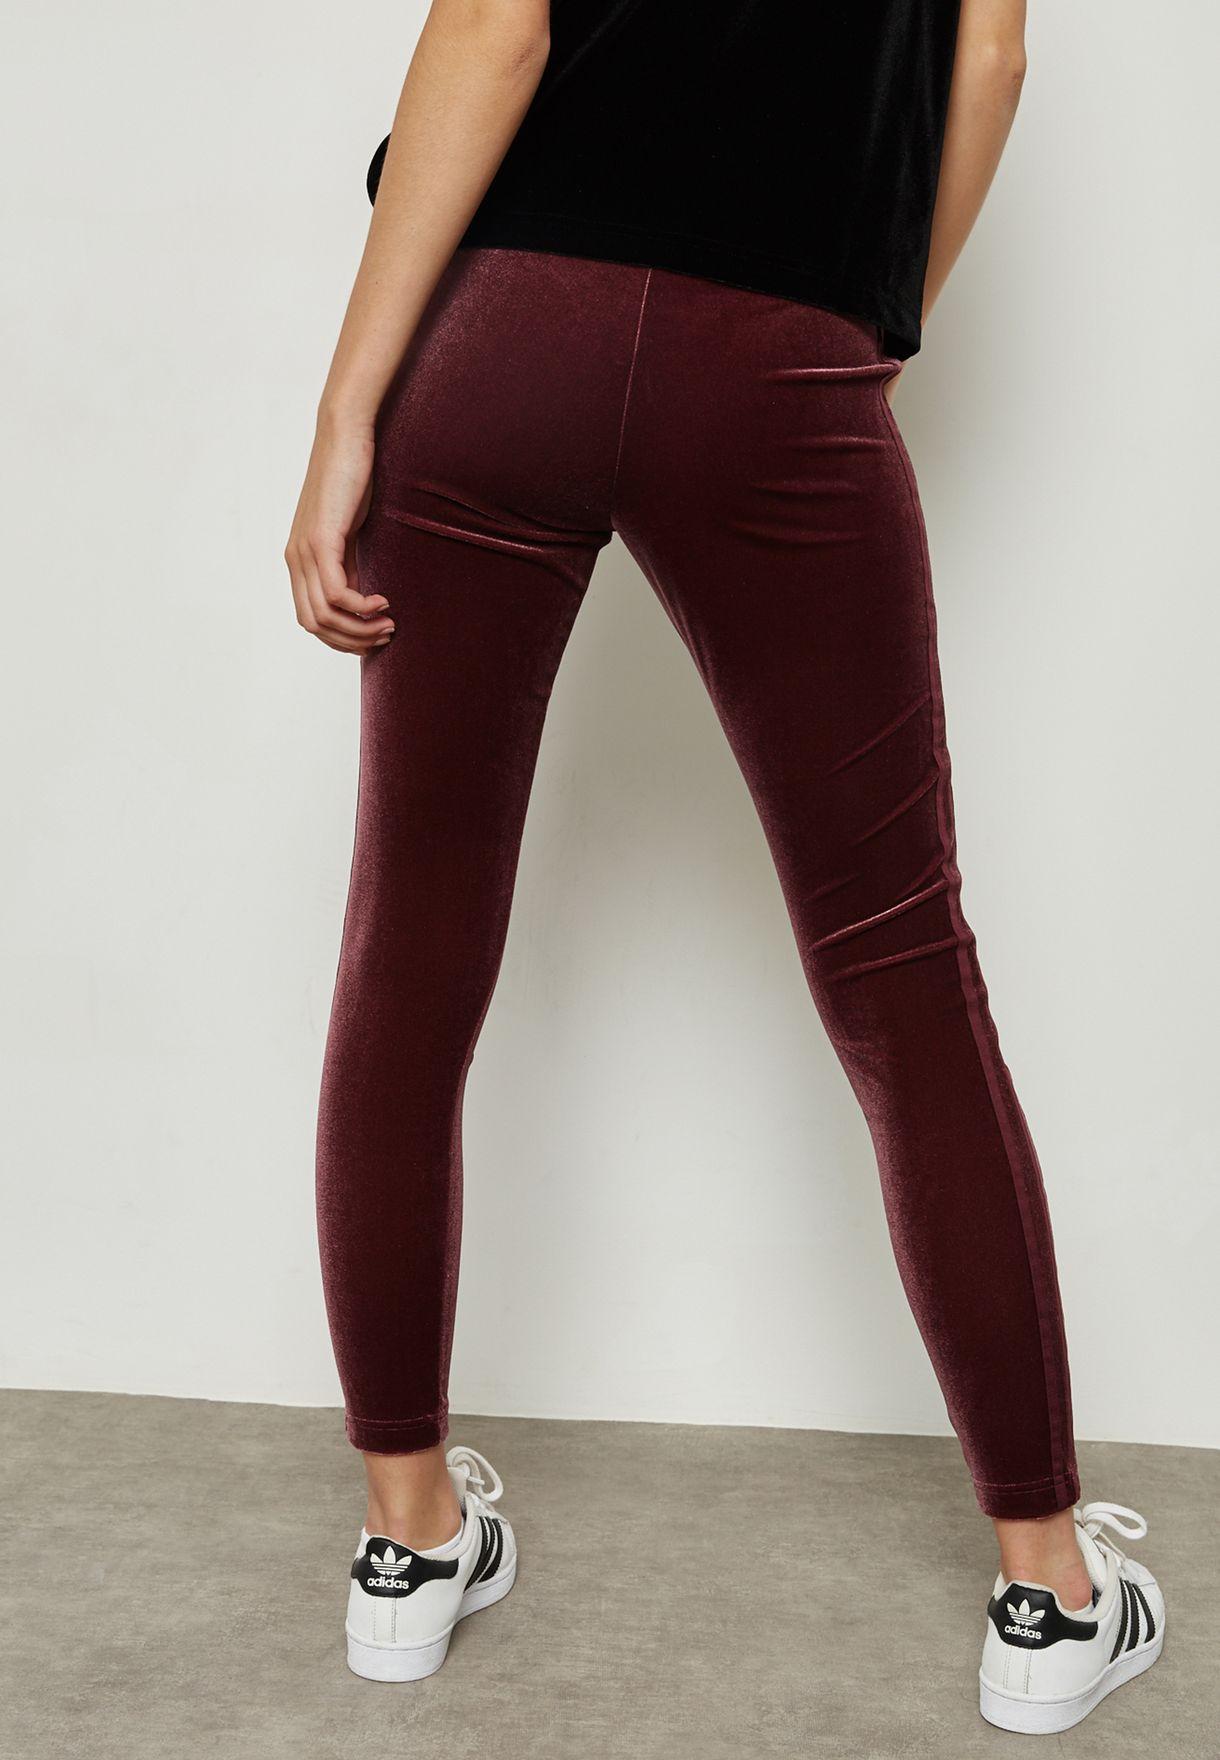 d44bec7eede43 Shop adidas Originals purple Velvet Vibes Leggings CW0276 for Women ...